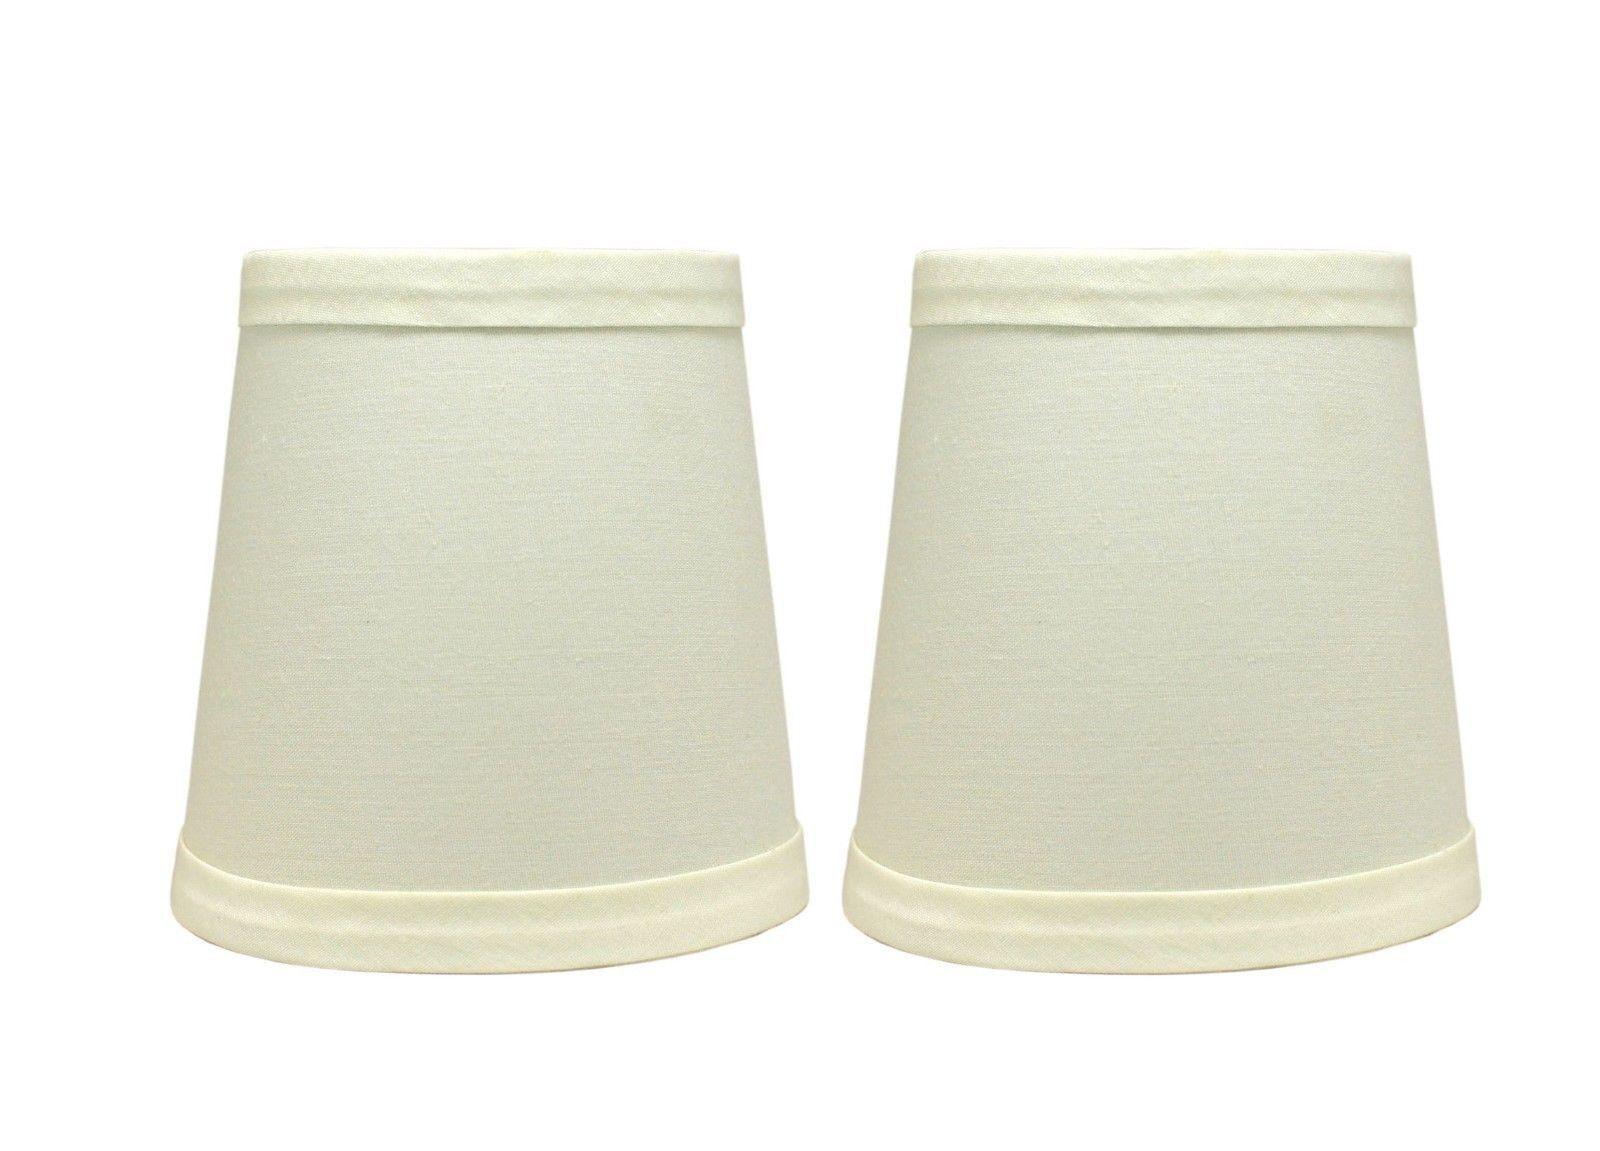 cotton chandelier mini lamp shades clip on hardback eggshell 3 x4 x. Black Bedroom Furniture Sets. Home Design Ideas